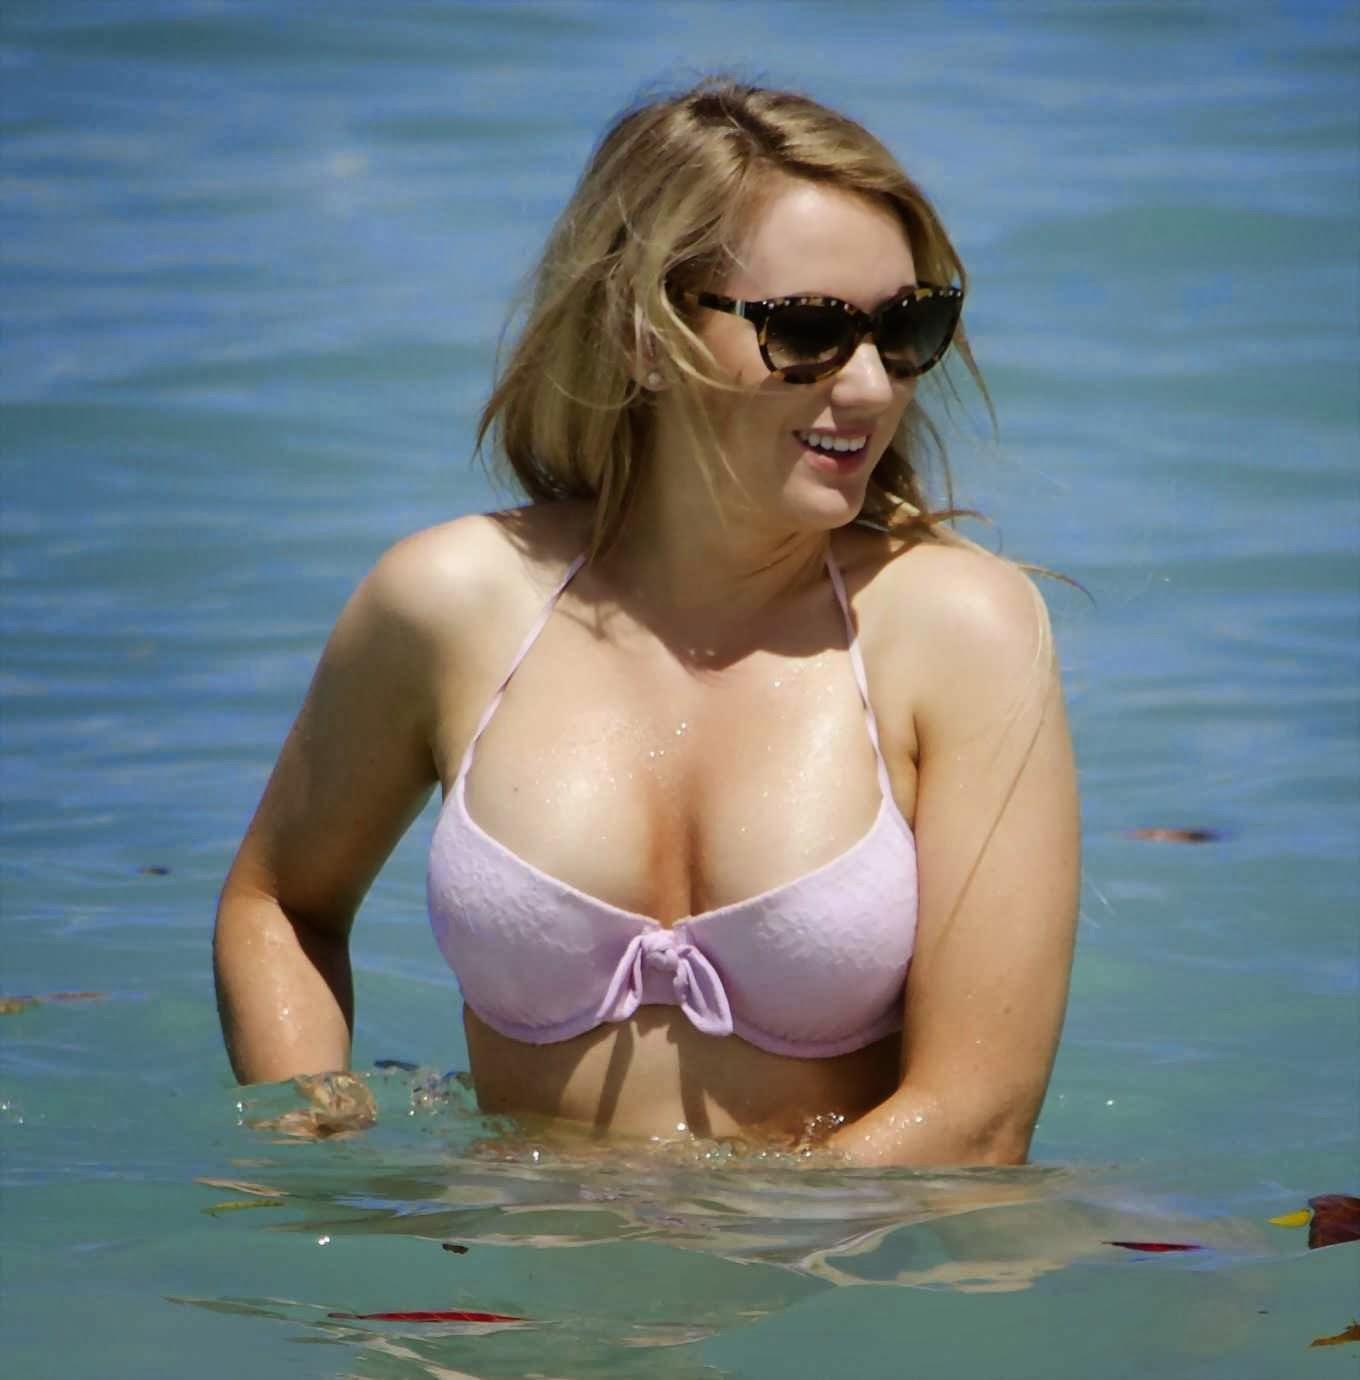 Rebecca Ferdinando wearing bright pink string bikini at the beach in Barbados